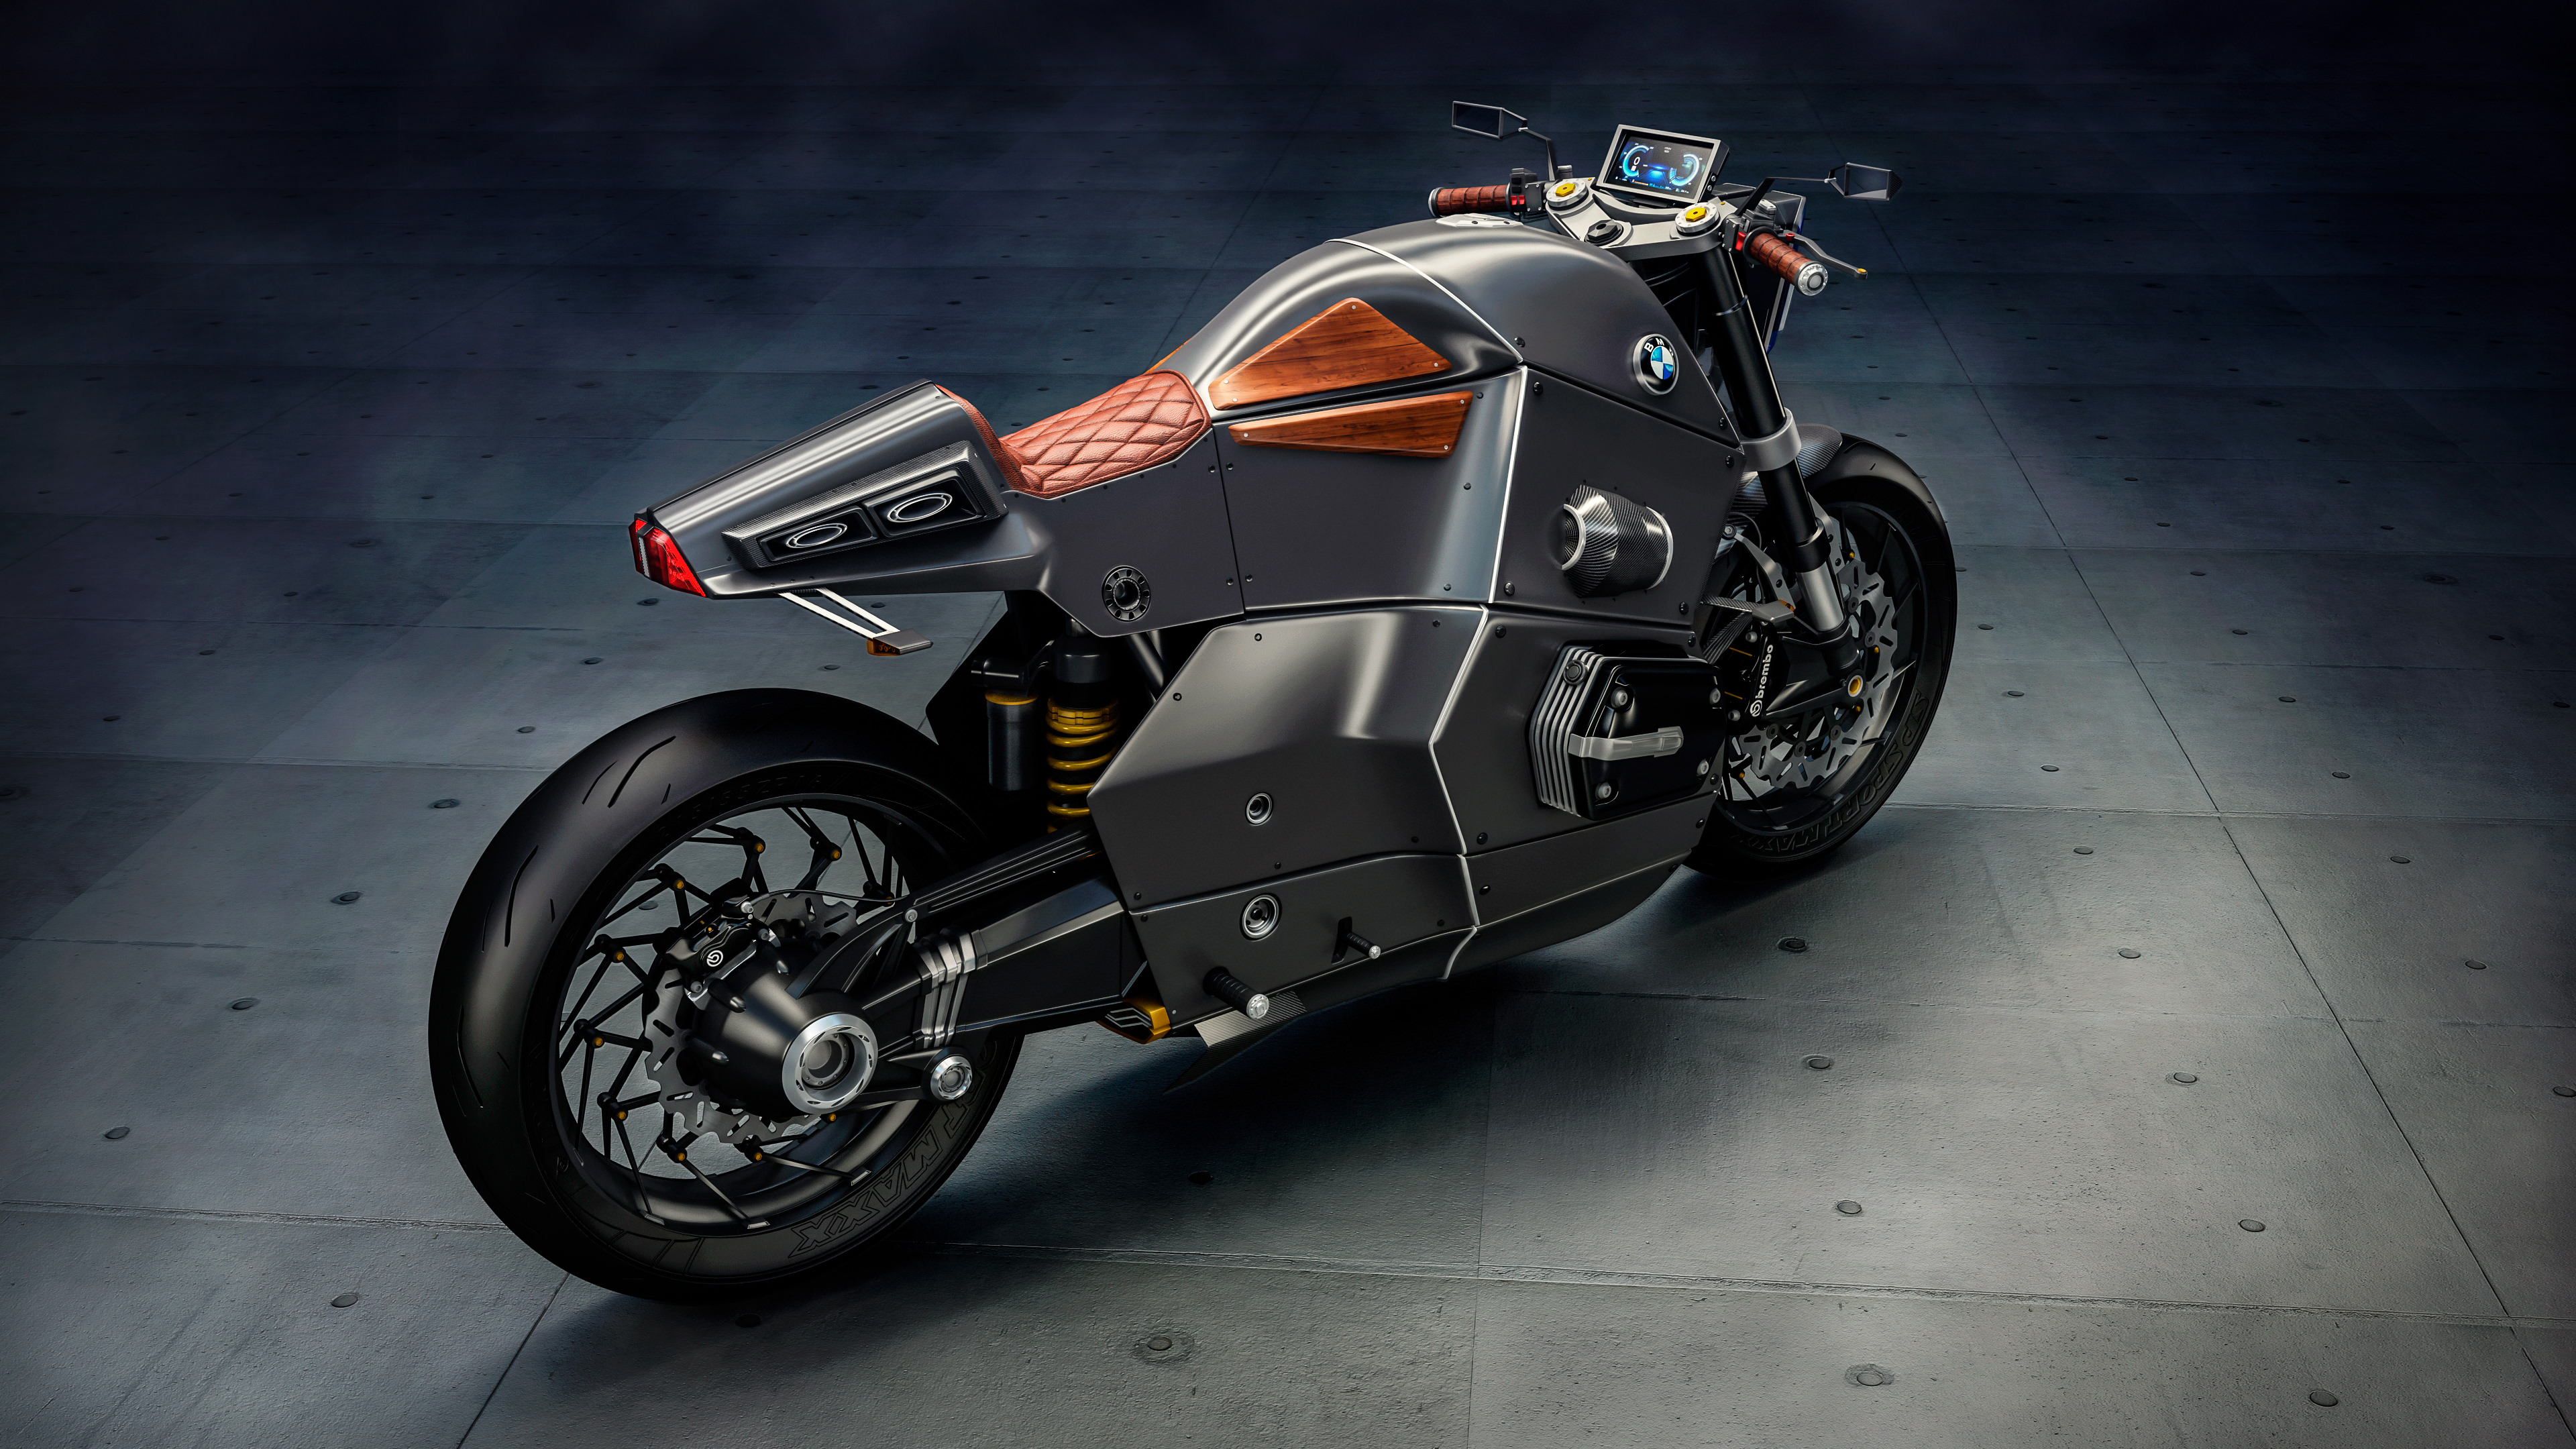 Мотоциклы BMW (БМВ). Каталог мототехники BMW